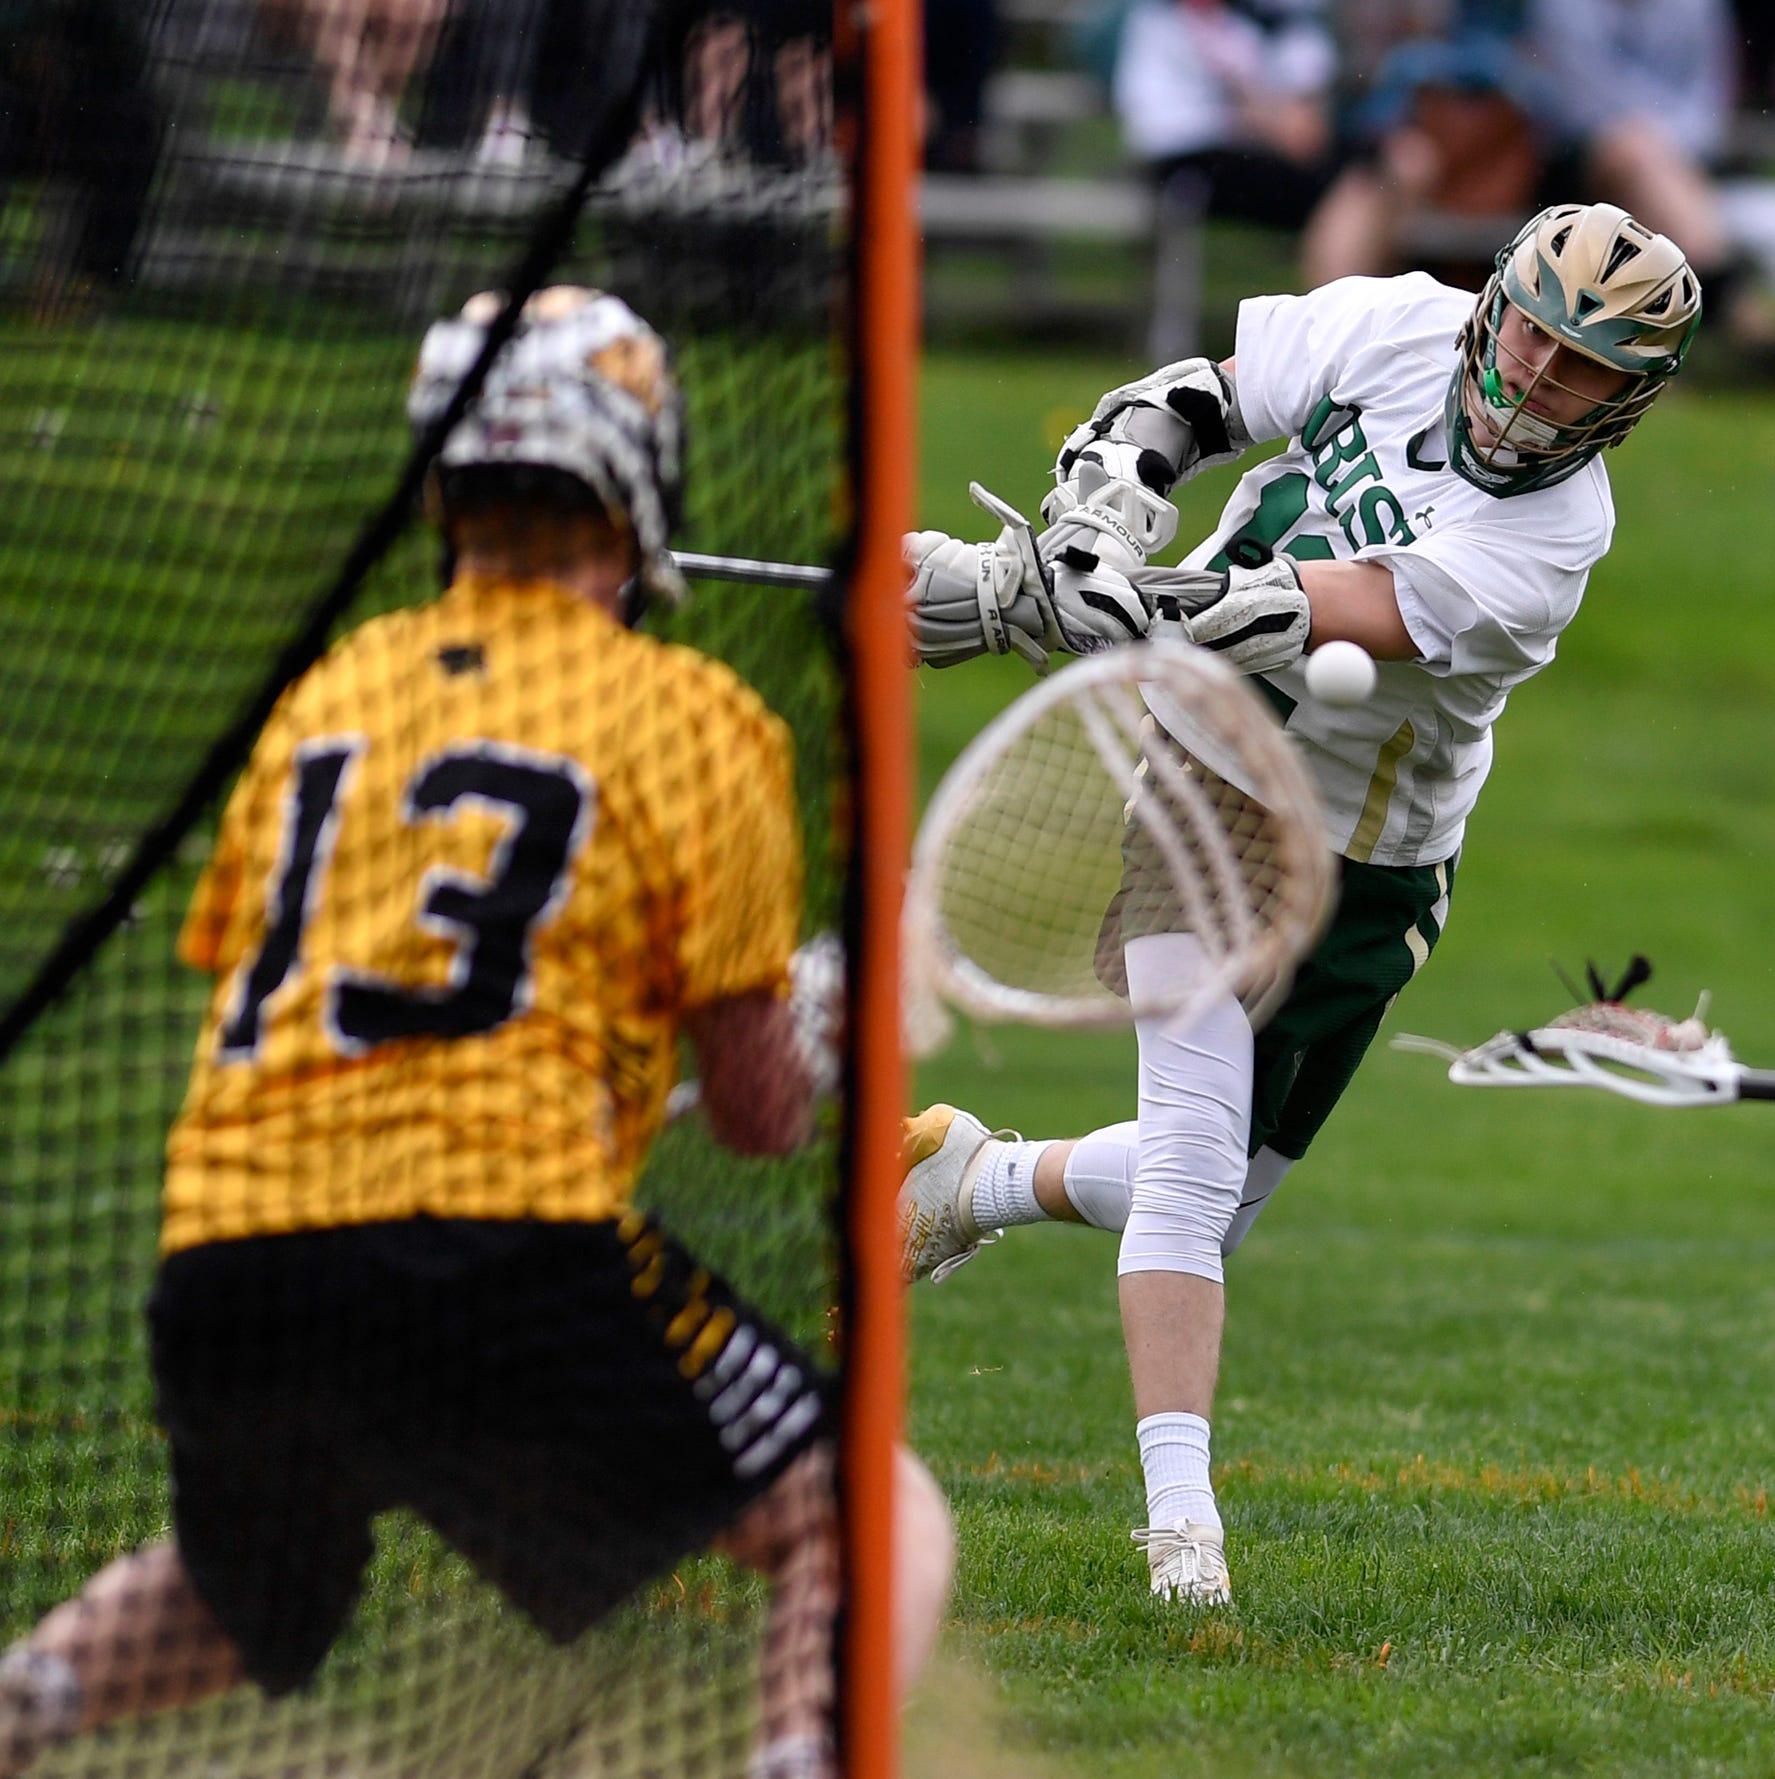 Chandler Hake, Connor Kernan, Ryan Muller earn major York-Adams boys' lacrosse honors